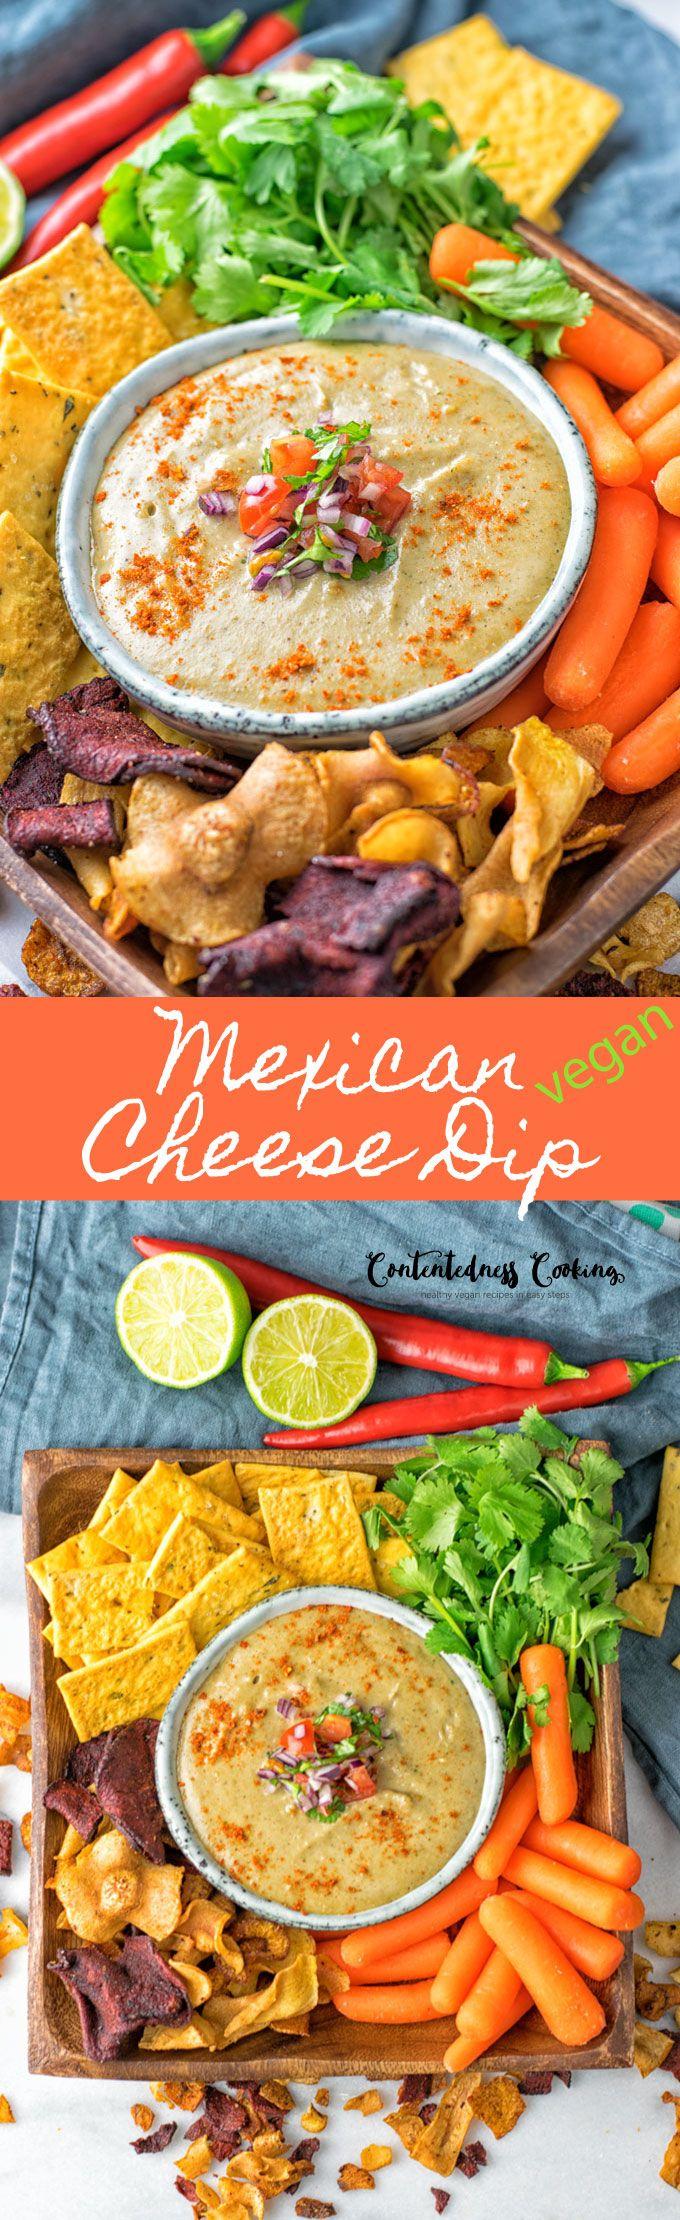 Mexican Cheese Dip [vegan, gf] Recipe Appetizer